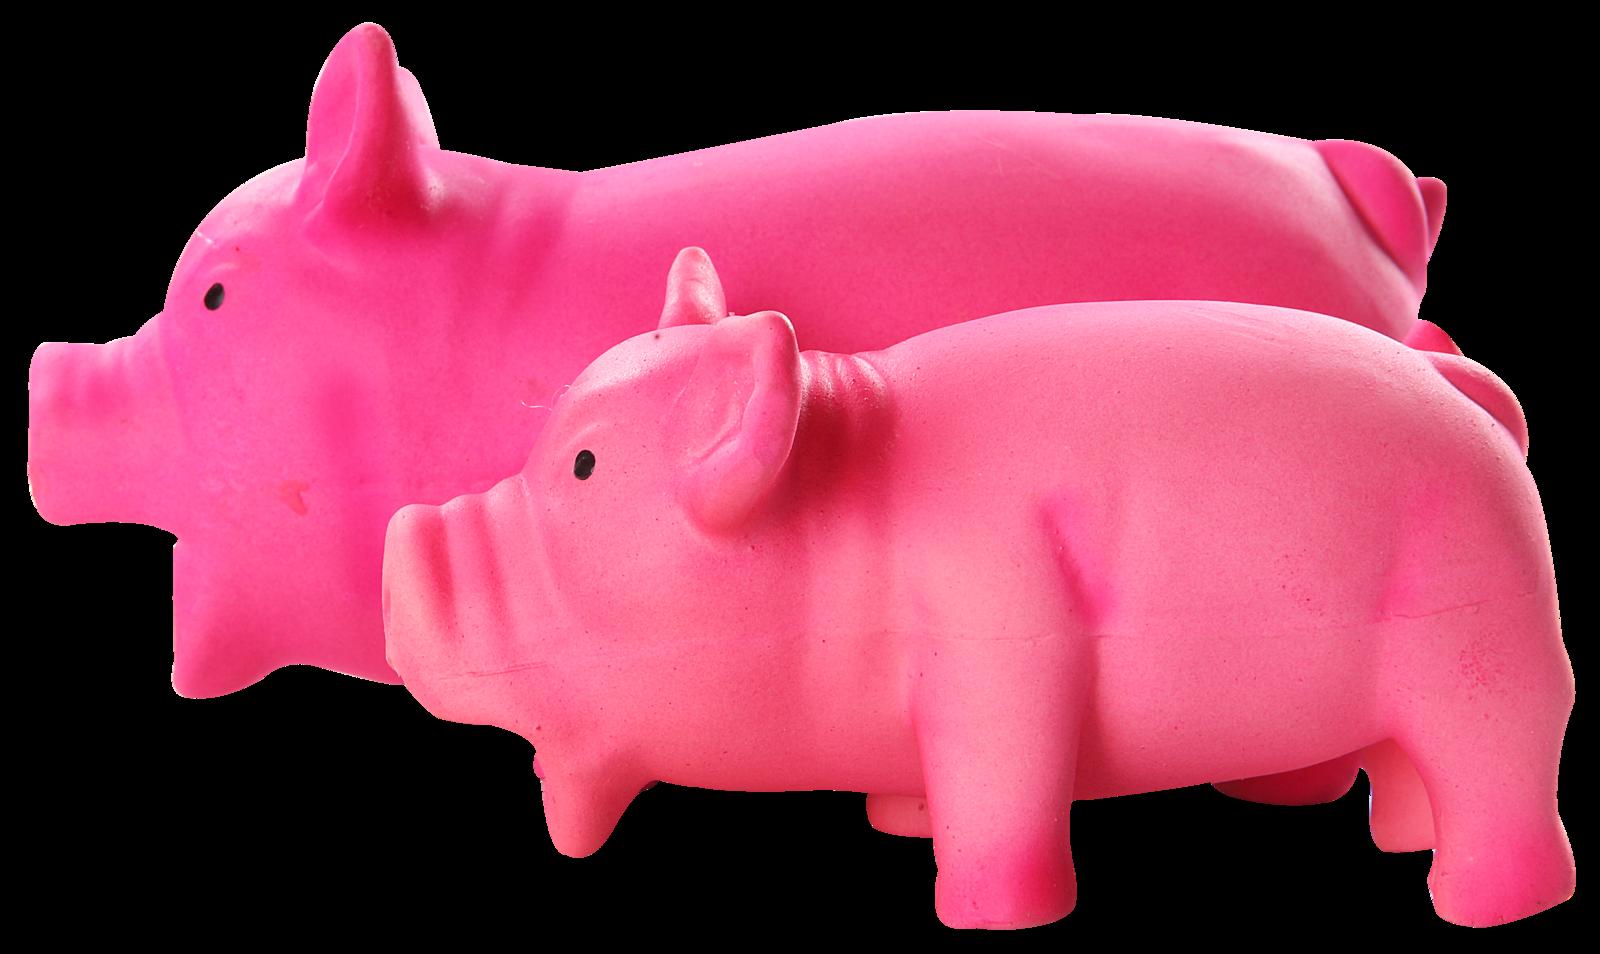 Pawise - Pink Latex Pig - Large image